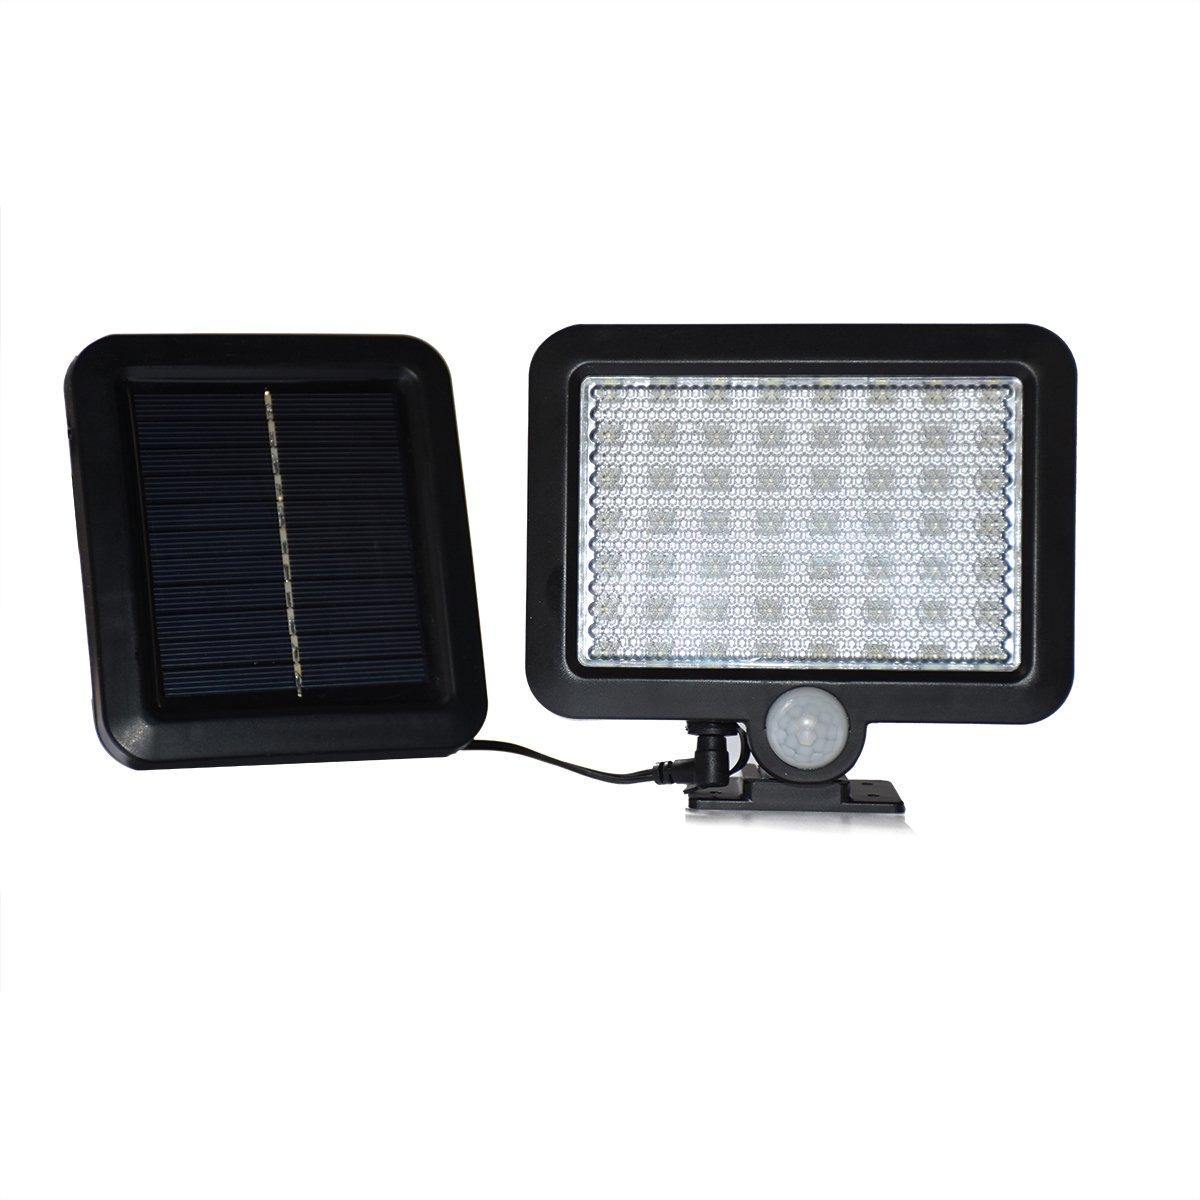 HuDieM Solar Lights, 56LEDs Waterproof Motion Sensor Light Outdoor Solar Led Security Lights with Motion Detector Night Wall Lights